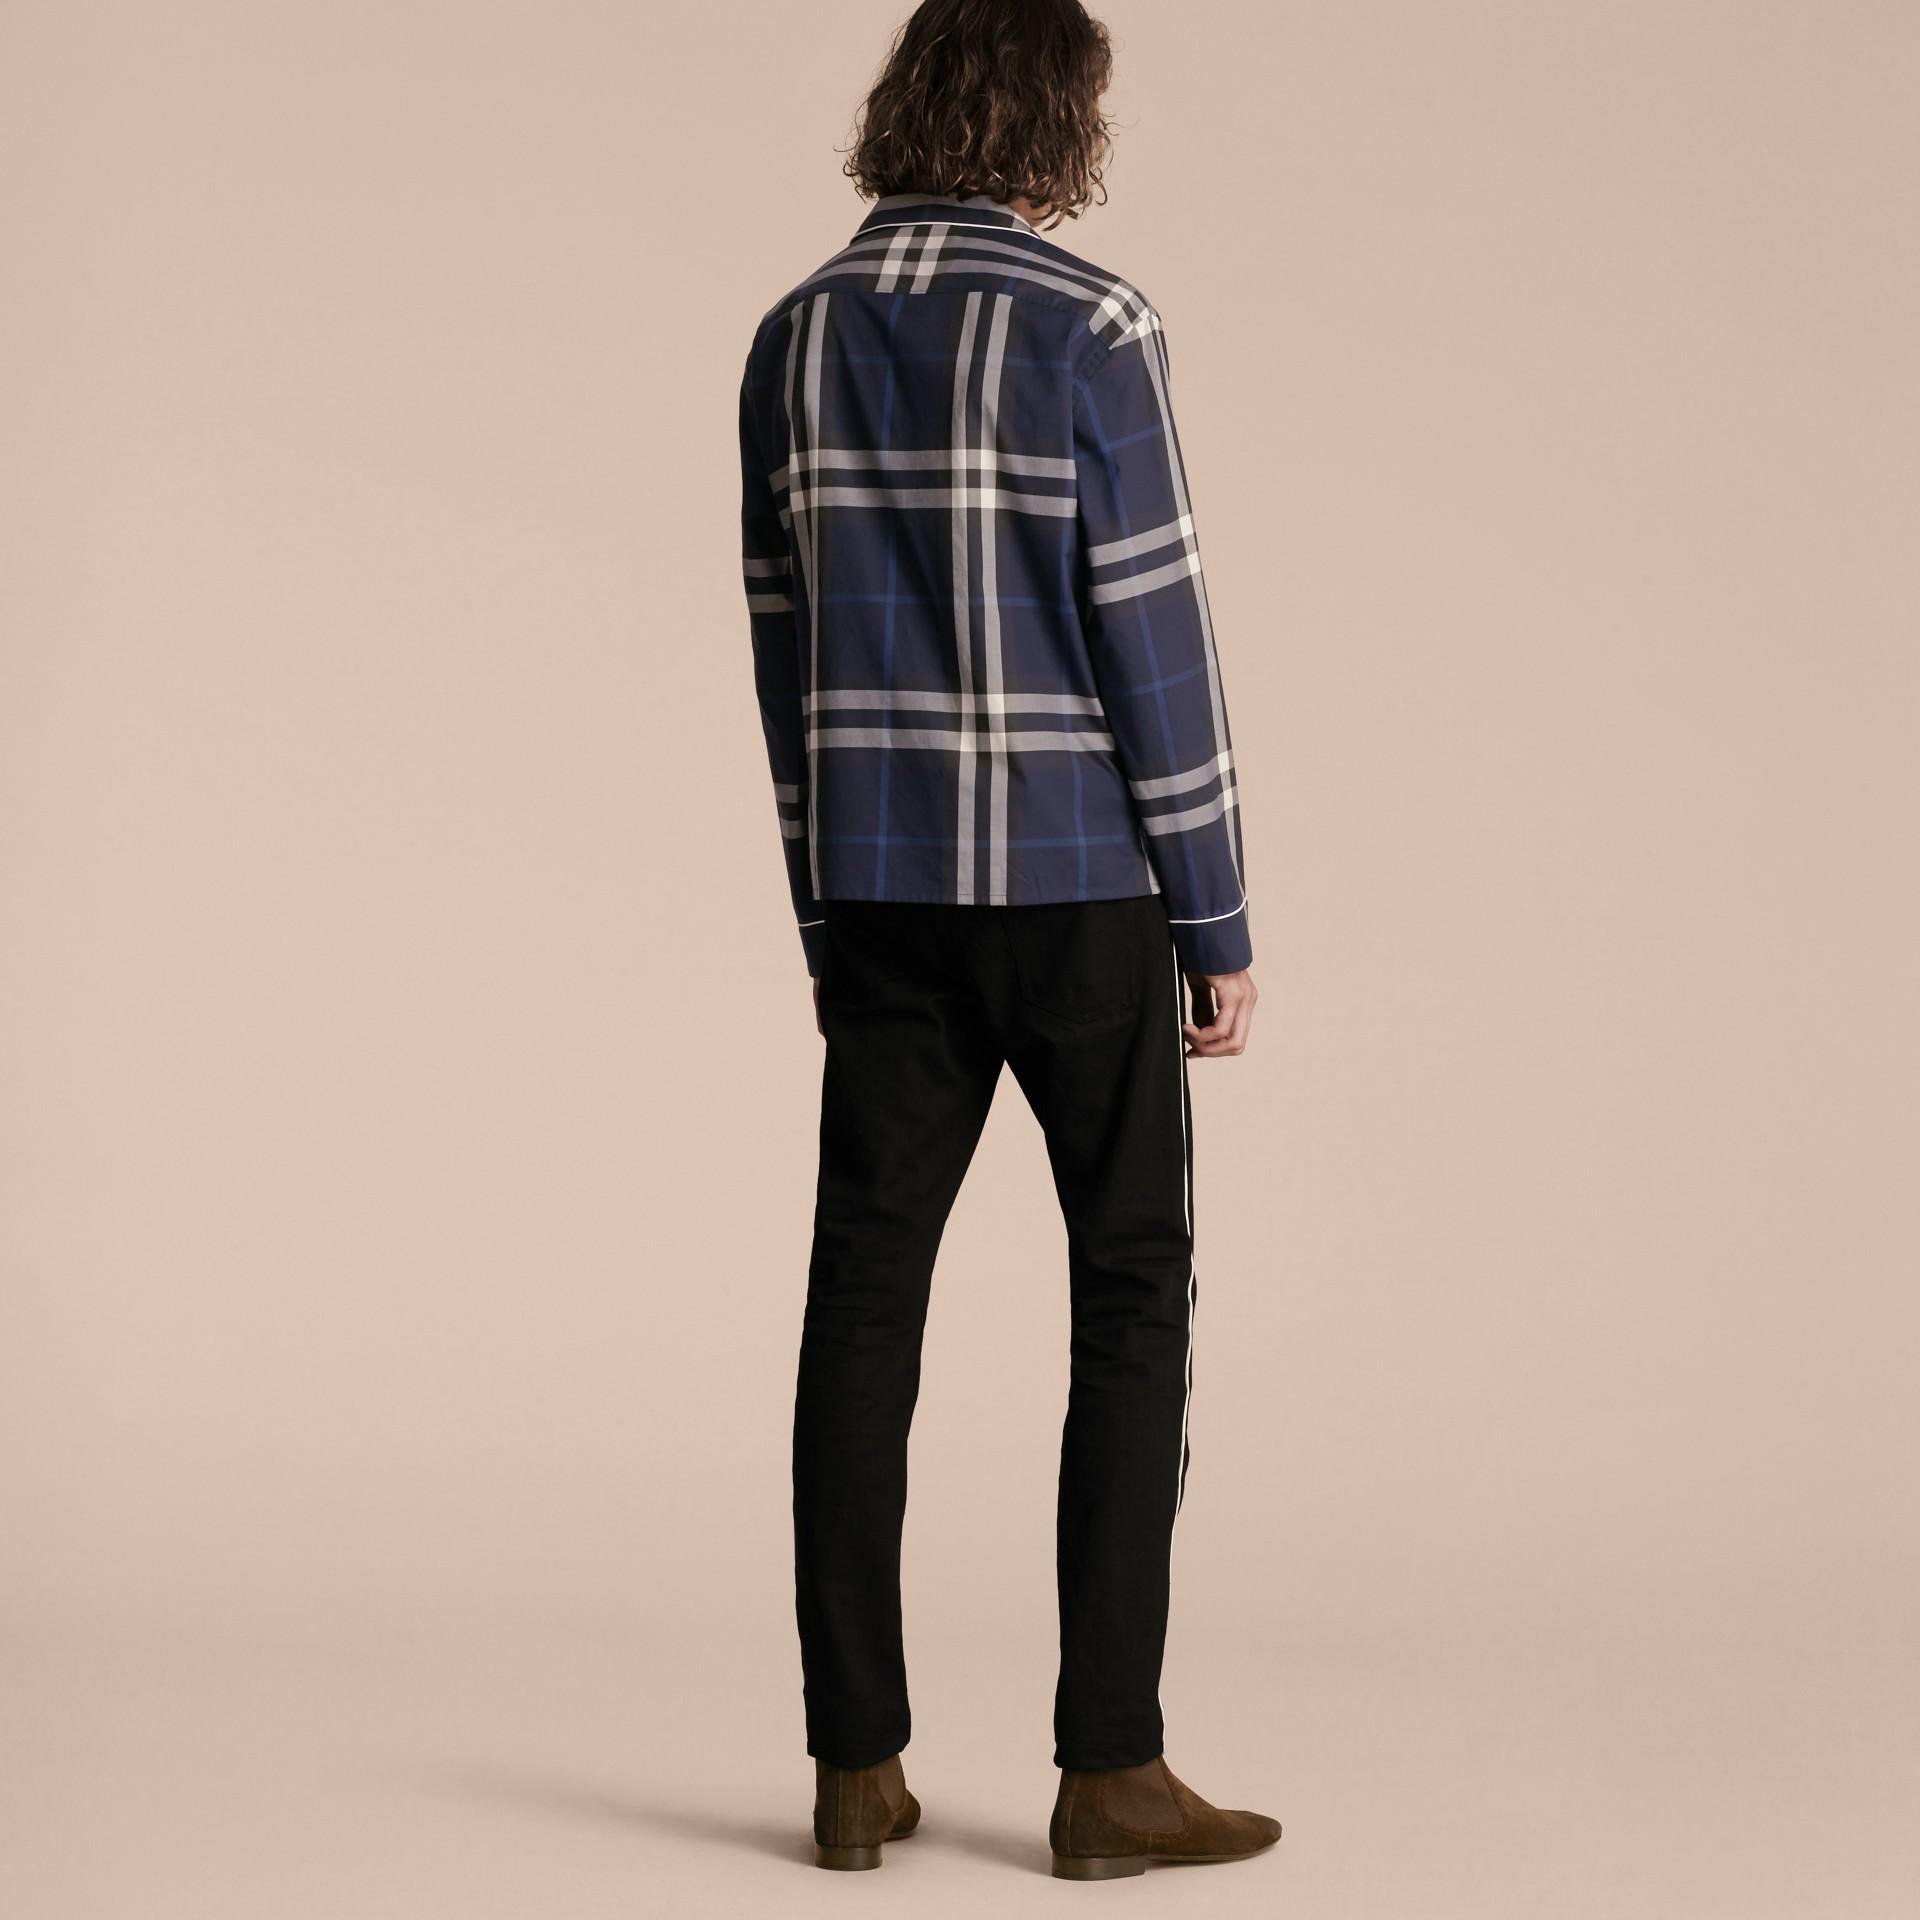 Indigo blue Check Cotton Pyjama-style Shirt Indigo Blue - gallery image 3